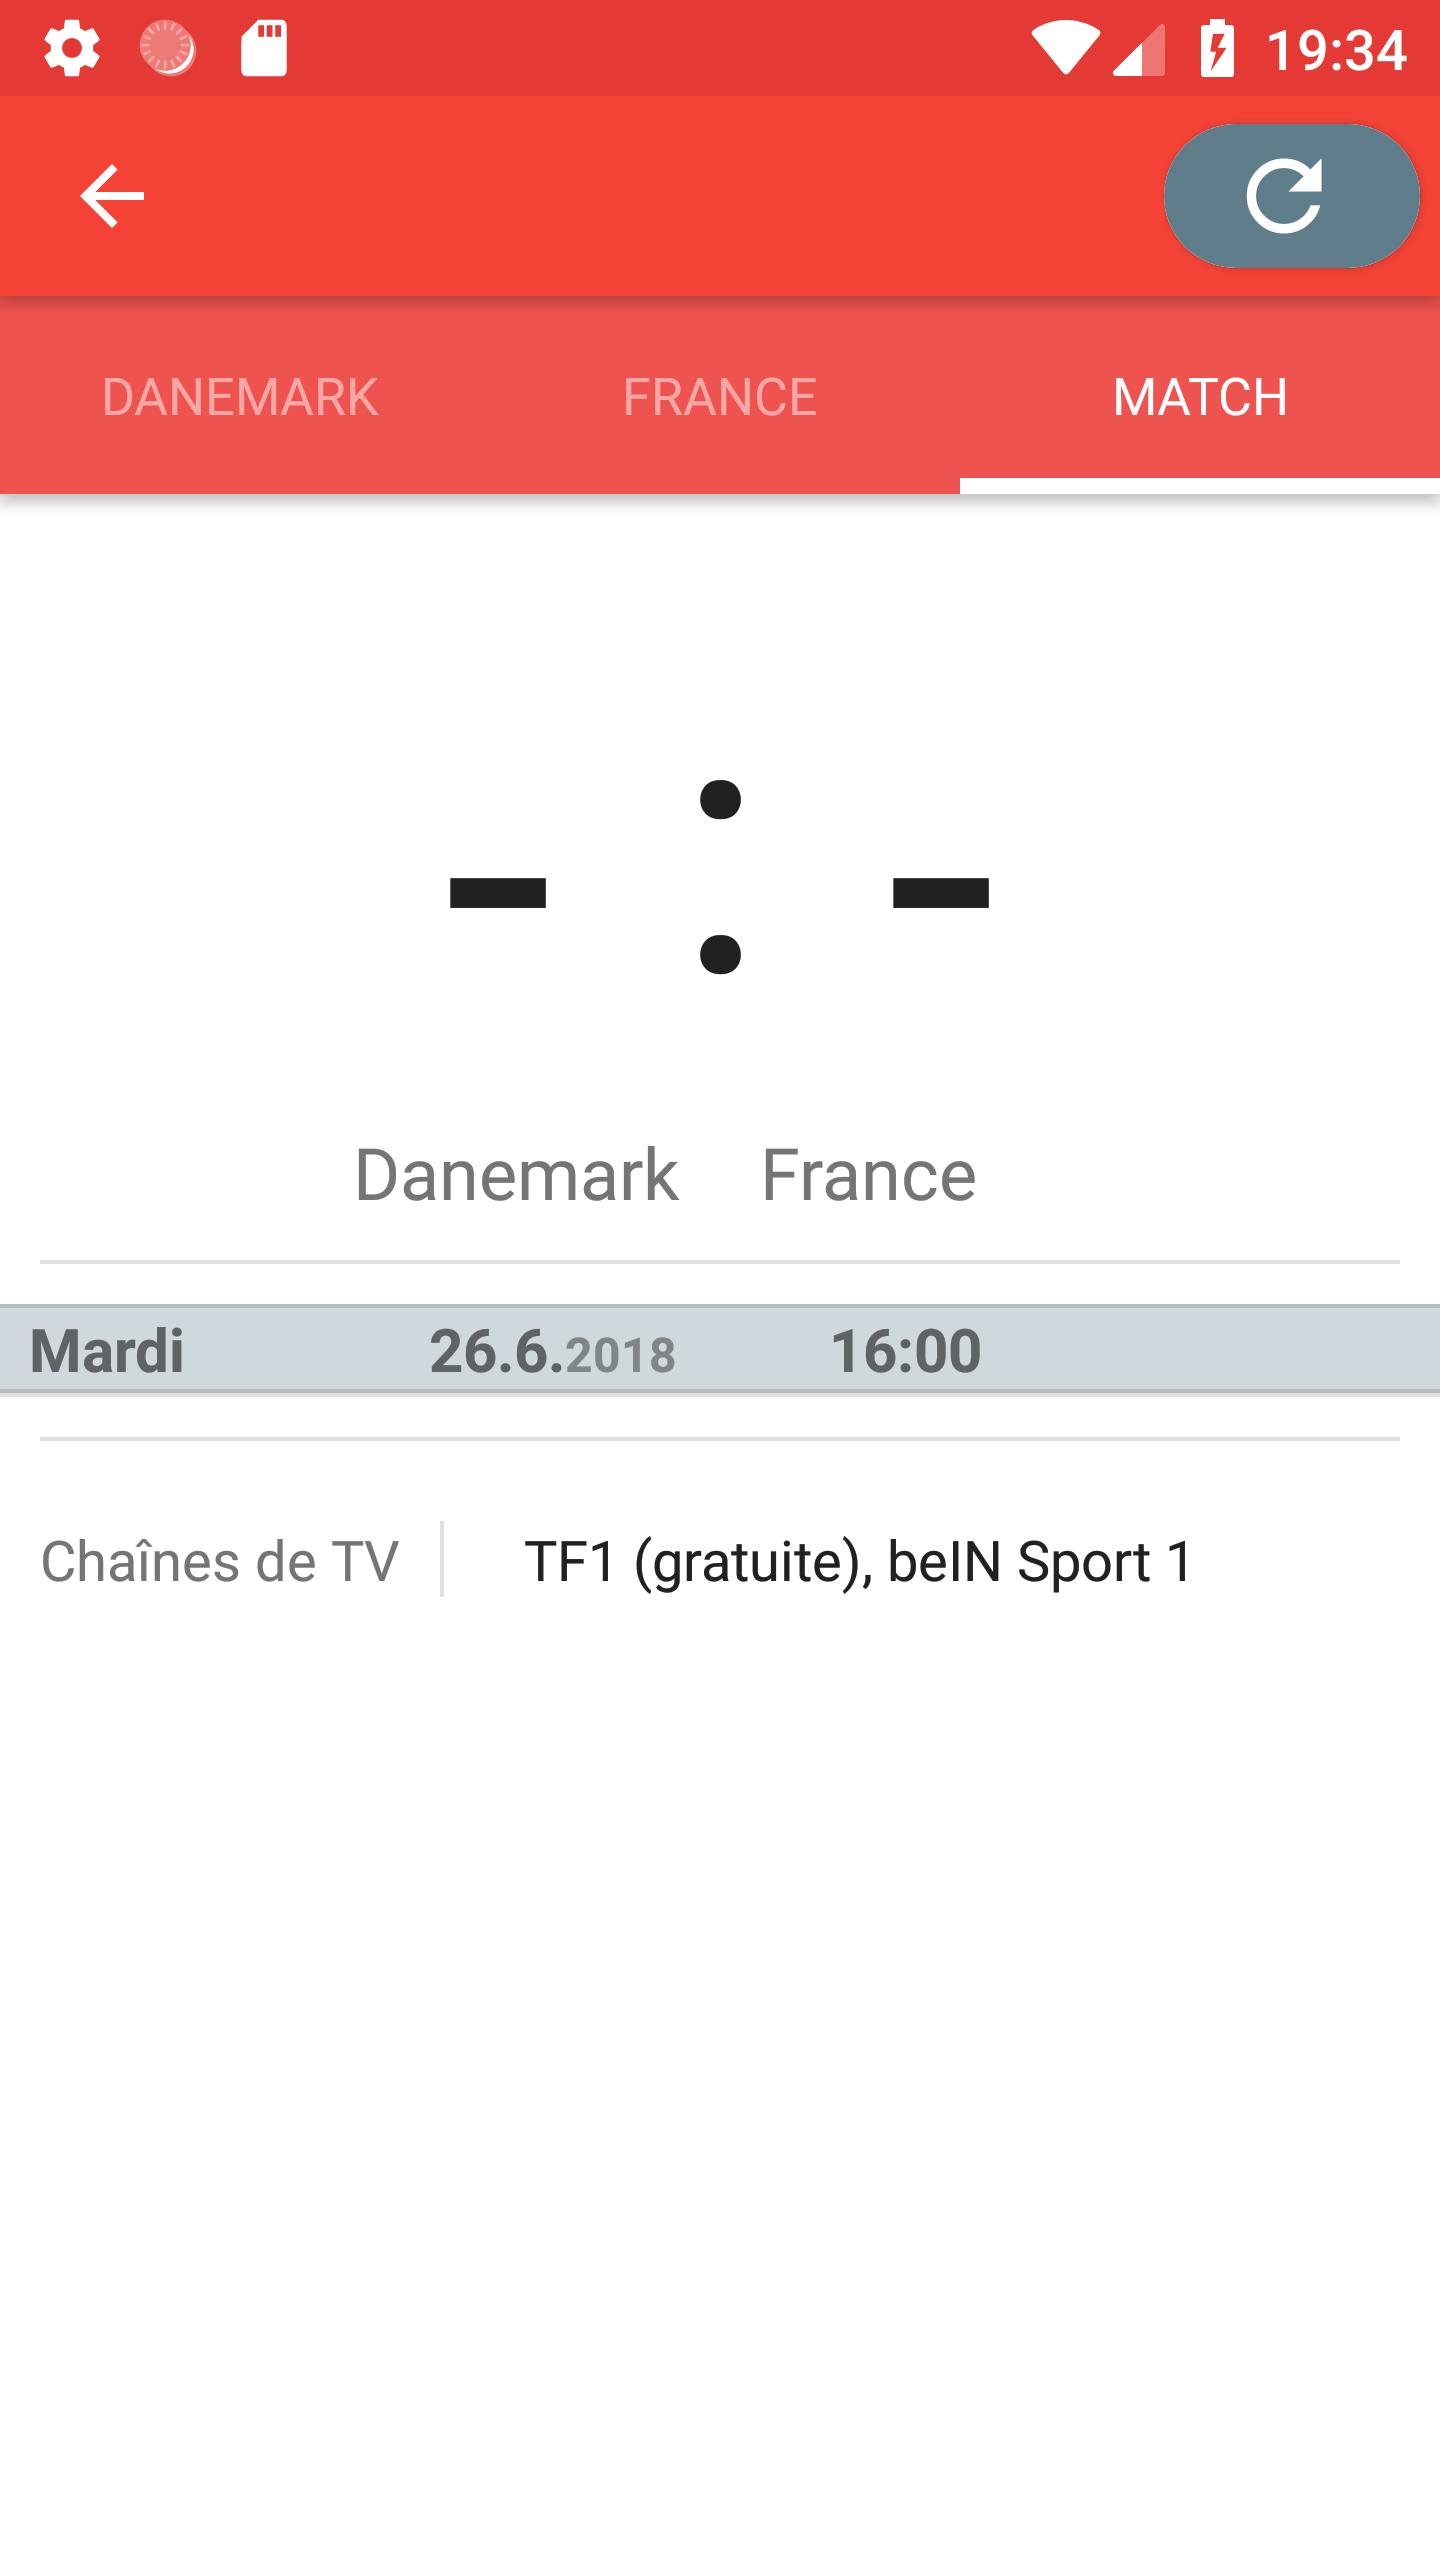 Euro Calendrier Match.Euro Calendrier 2020 Eliminatoires Pour Android